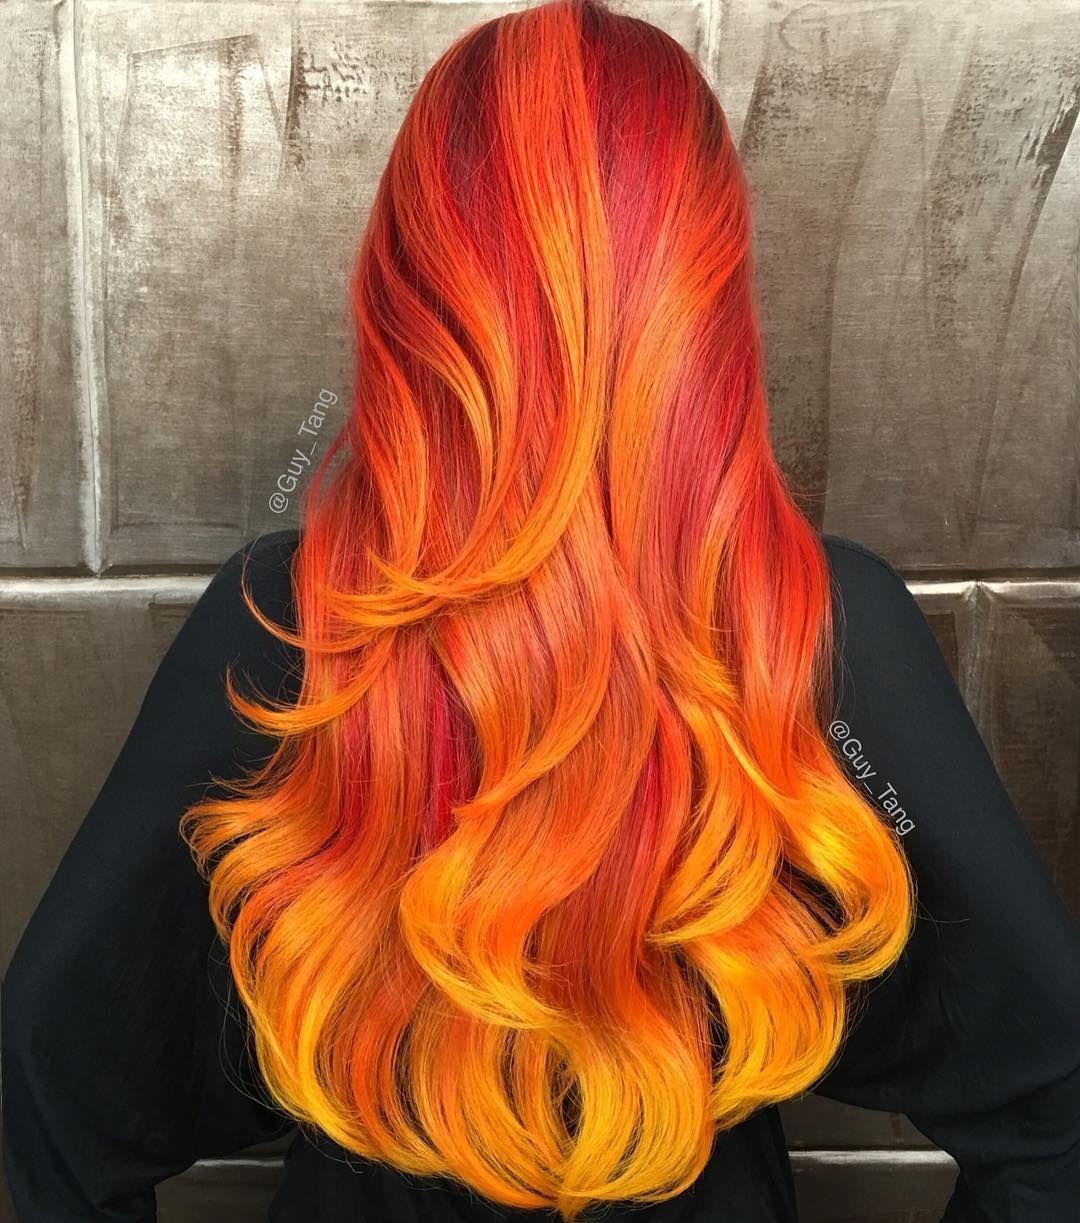 Cool boy hair dye orangehair syntheticwigs ombrehair halloweenhairstyle  hair